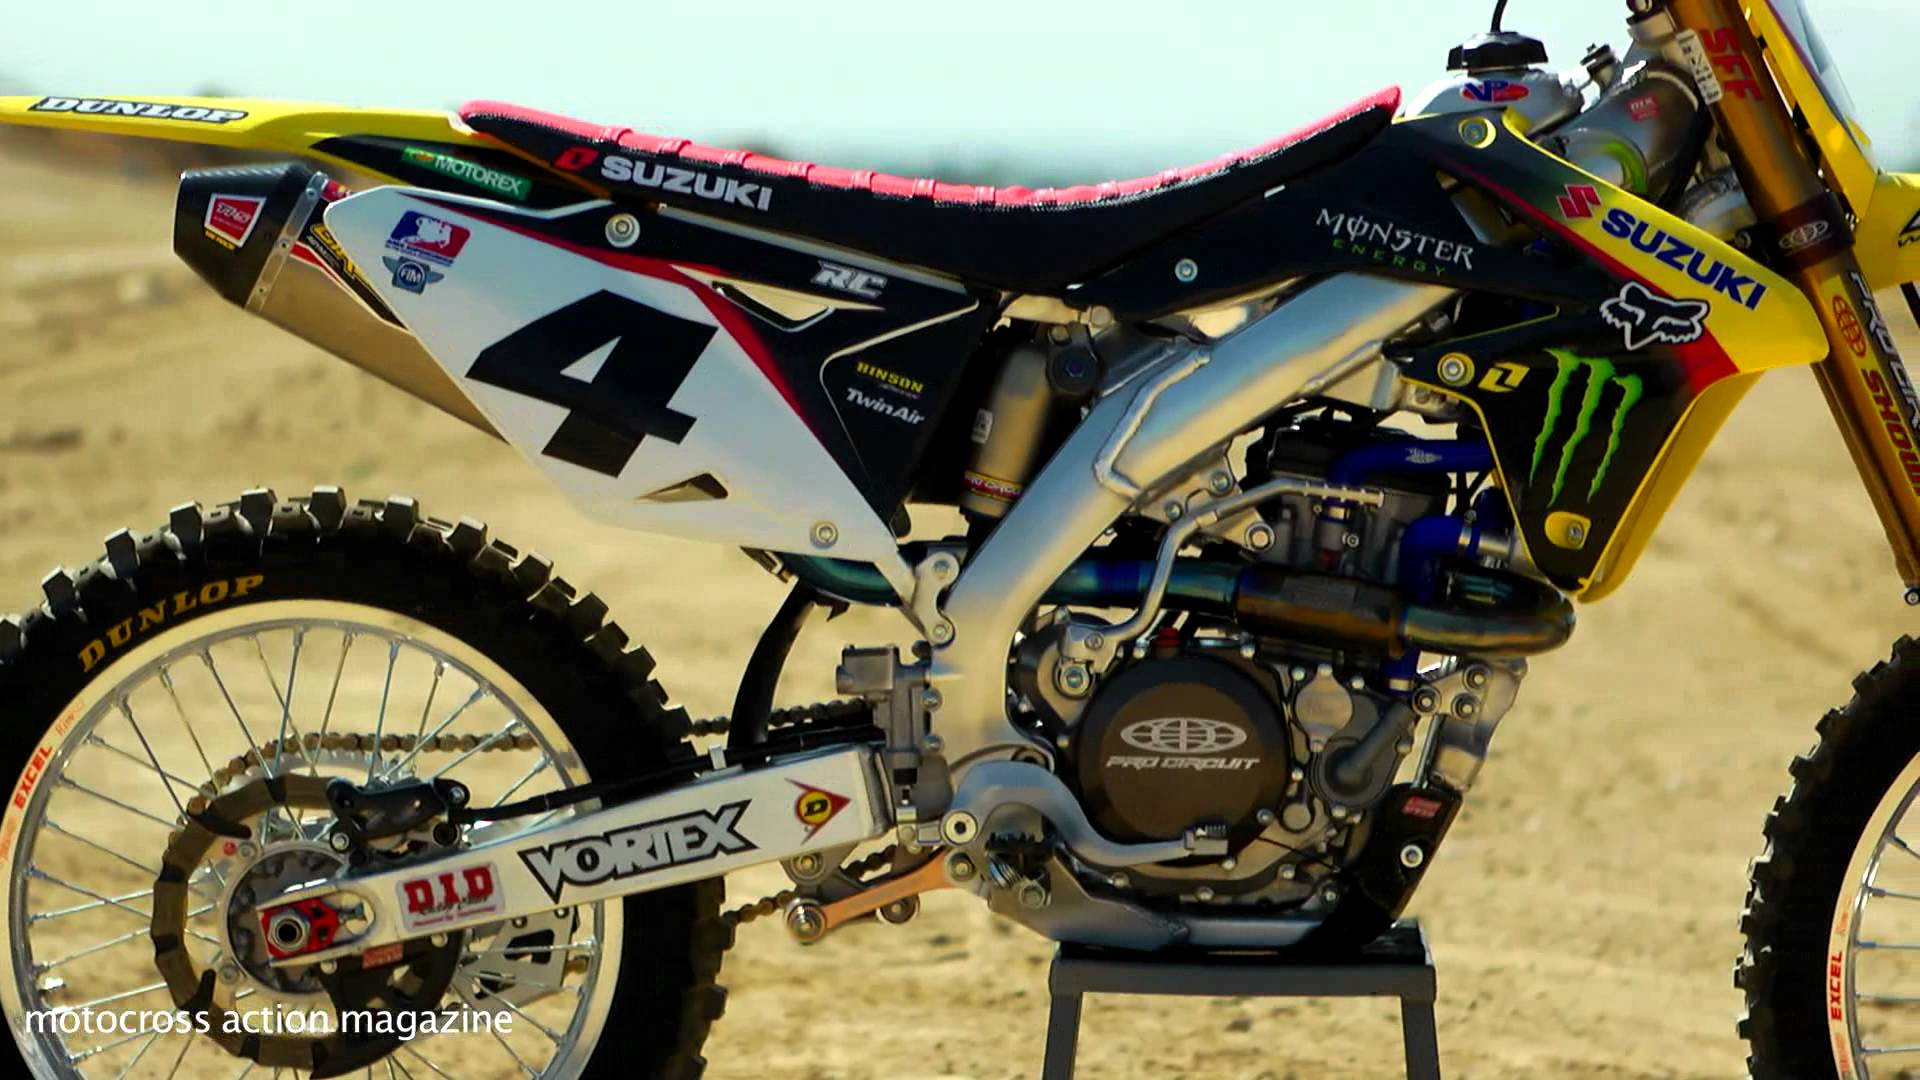 Motocross suzuki rmz 450 wallpaper 1920x1080 34874 1920x1080